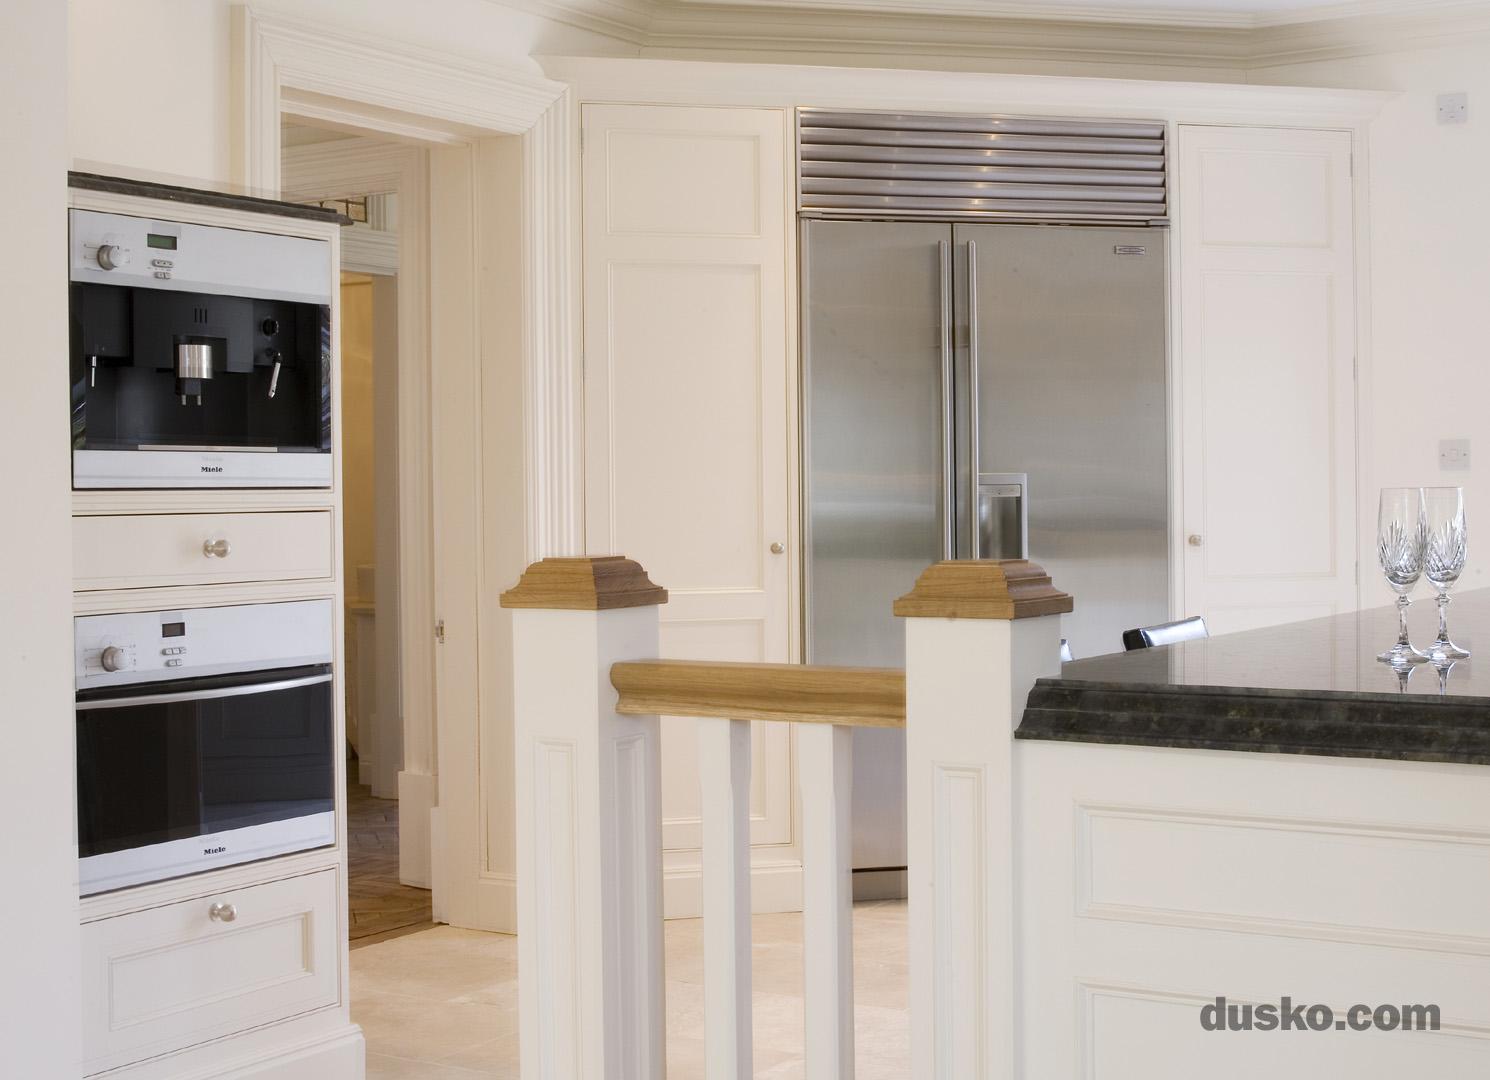 Edwardian Style Kitchen in Wilmslow, Cheshire Edwardian Corbels